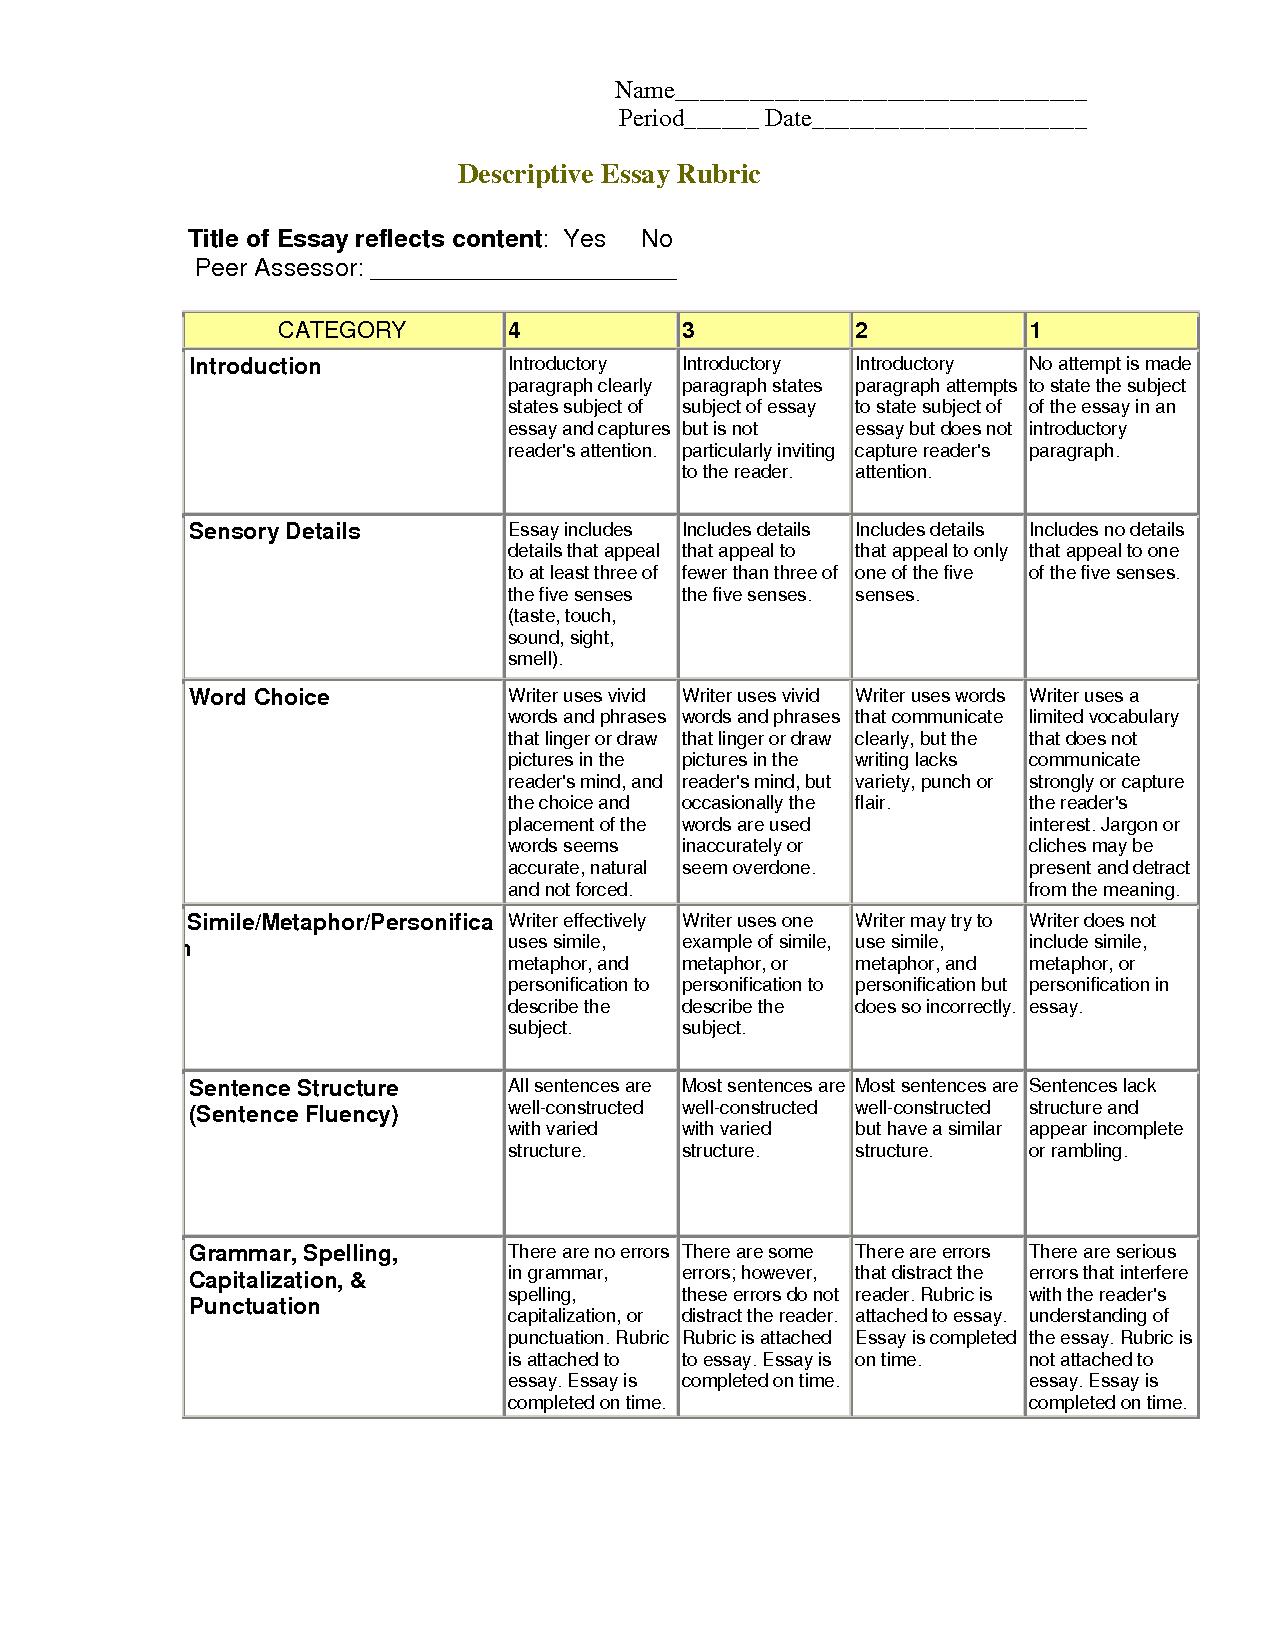 Descriptive Writing Rubric